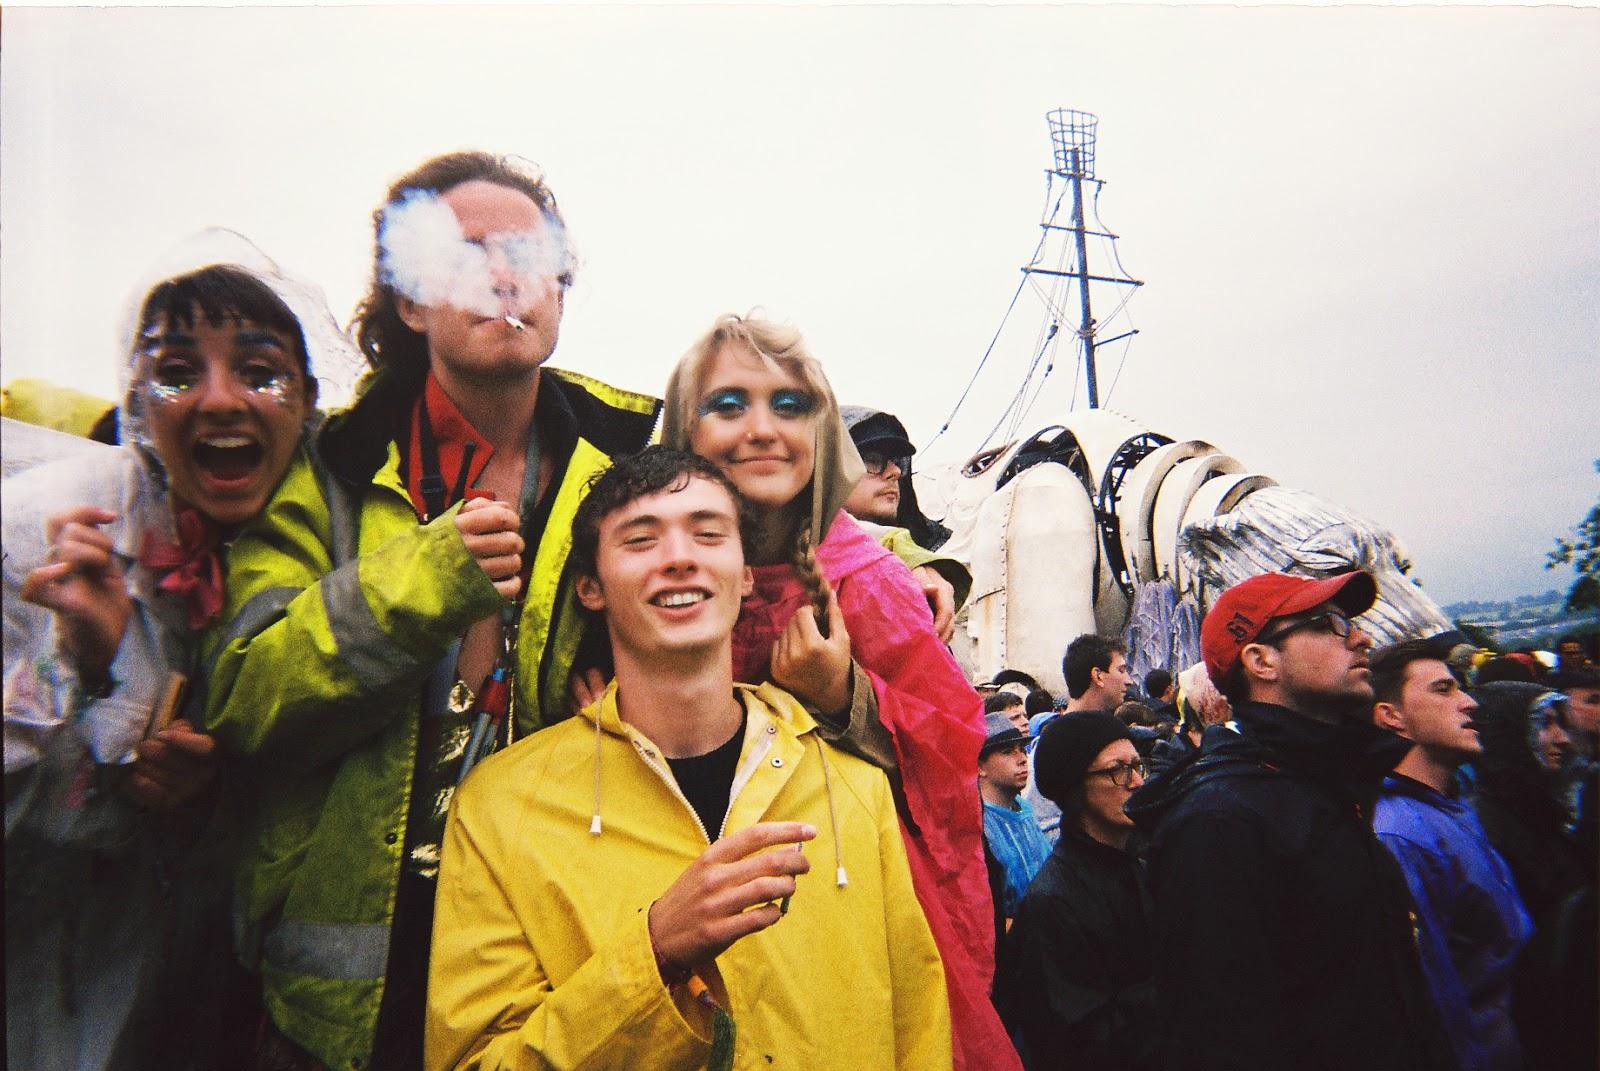 Greenpeace field, glastonbury, polar bear, New york Brass band